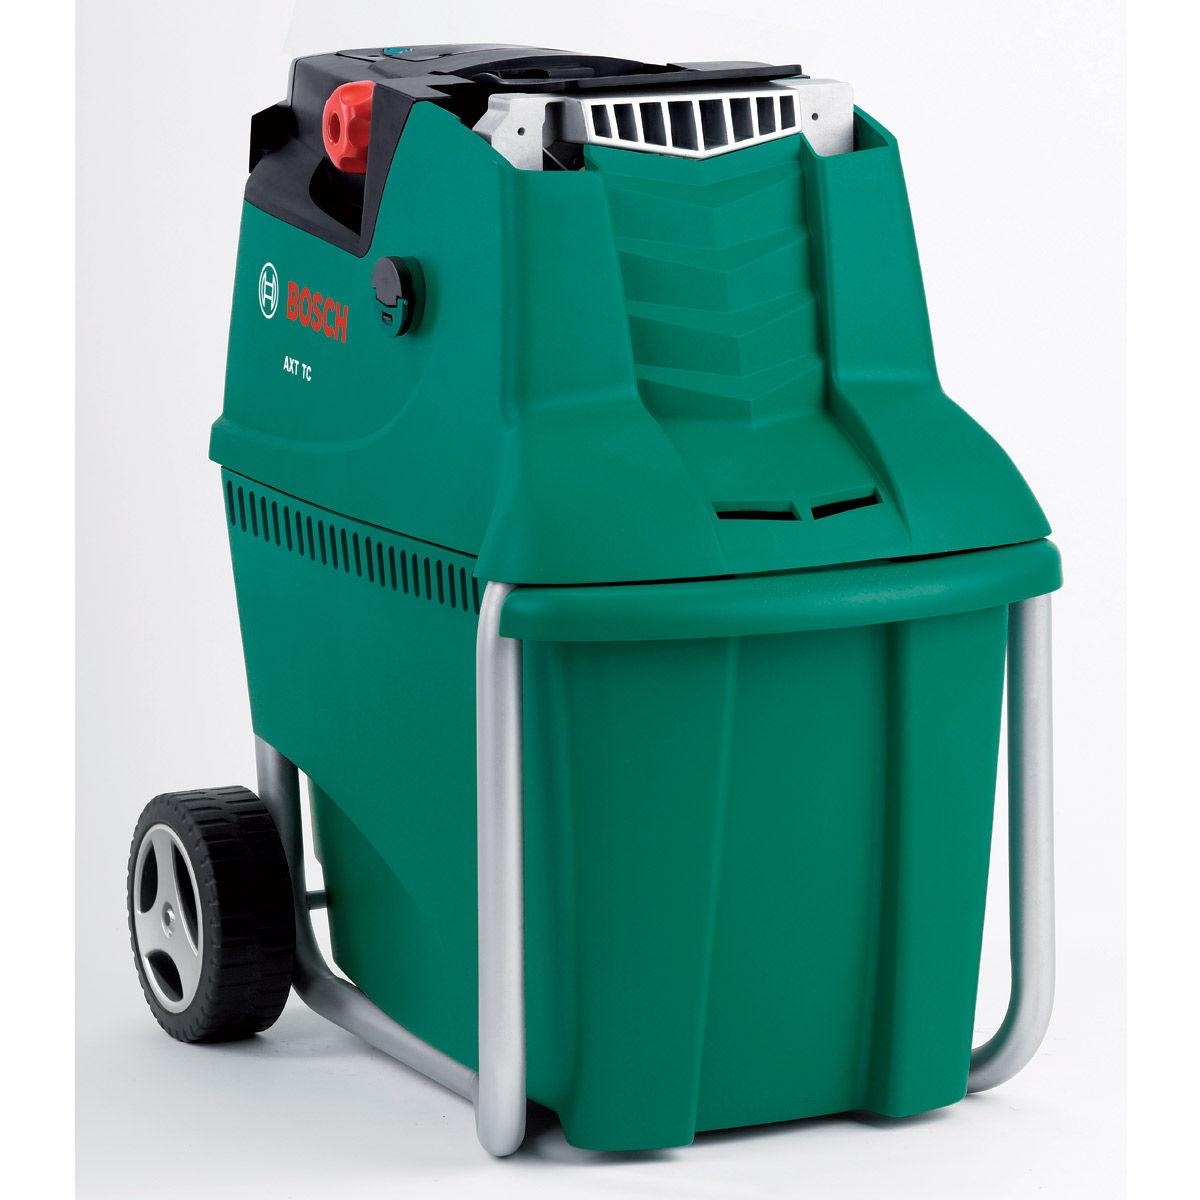 toolstop bosch axt25tc 2500 w electric garden shredder 240v. Black Bedroom Furniture Sets. Home Design Ideas